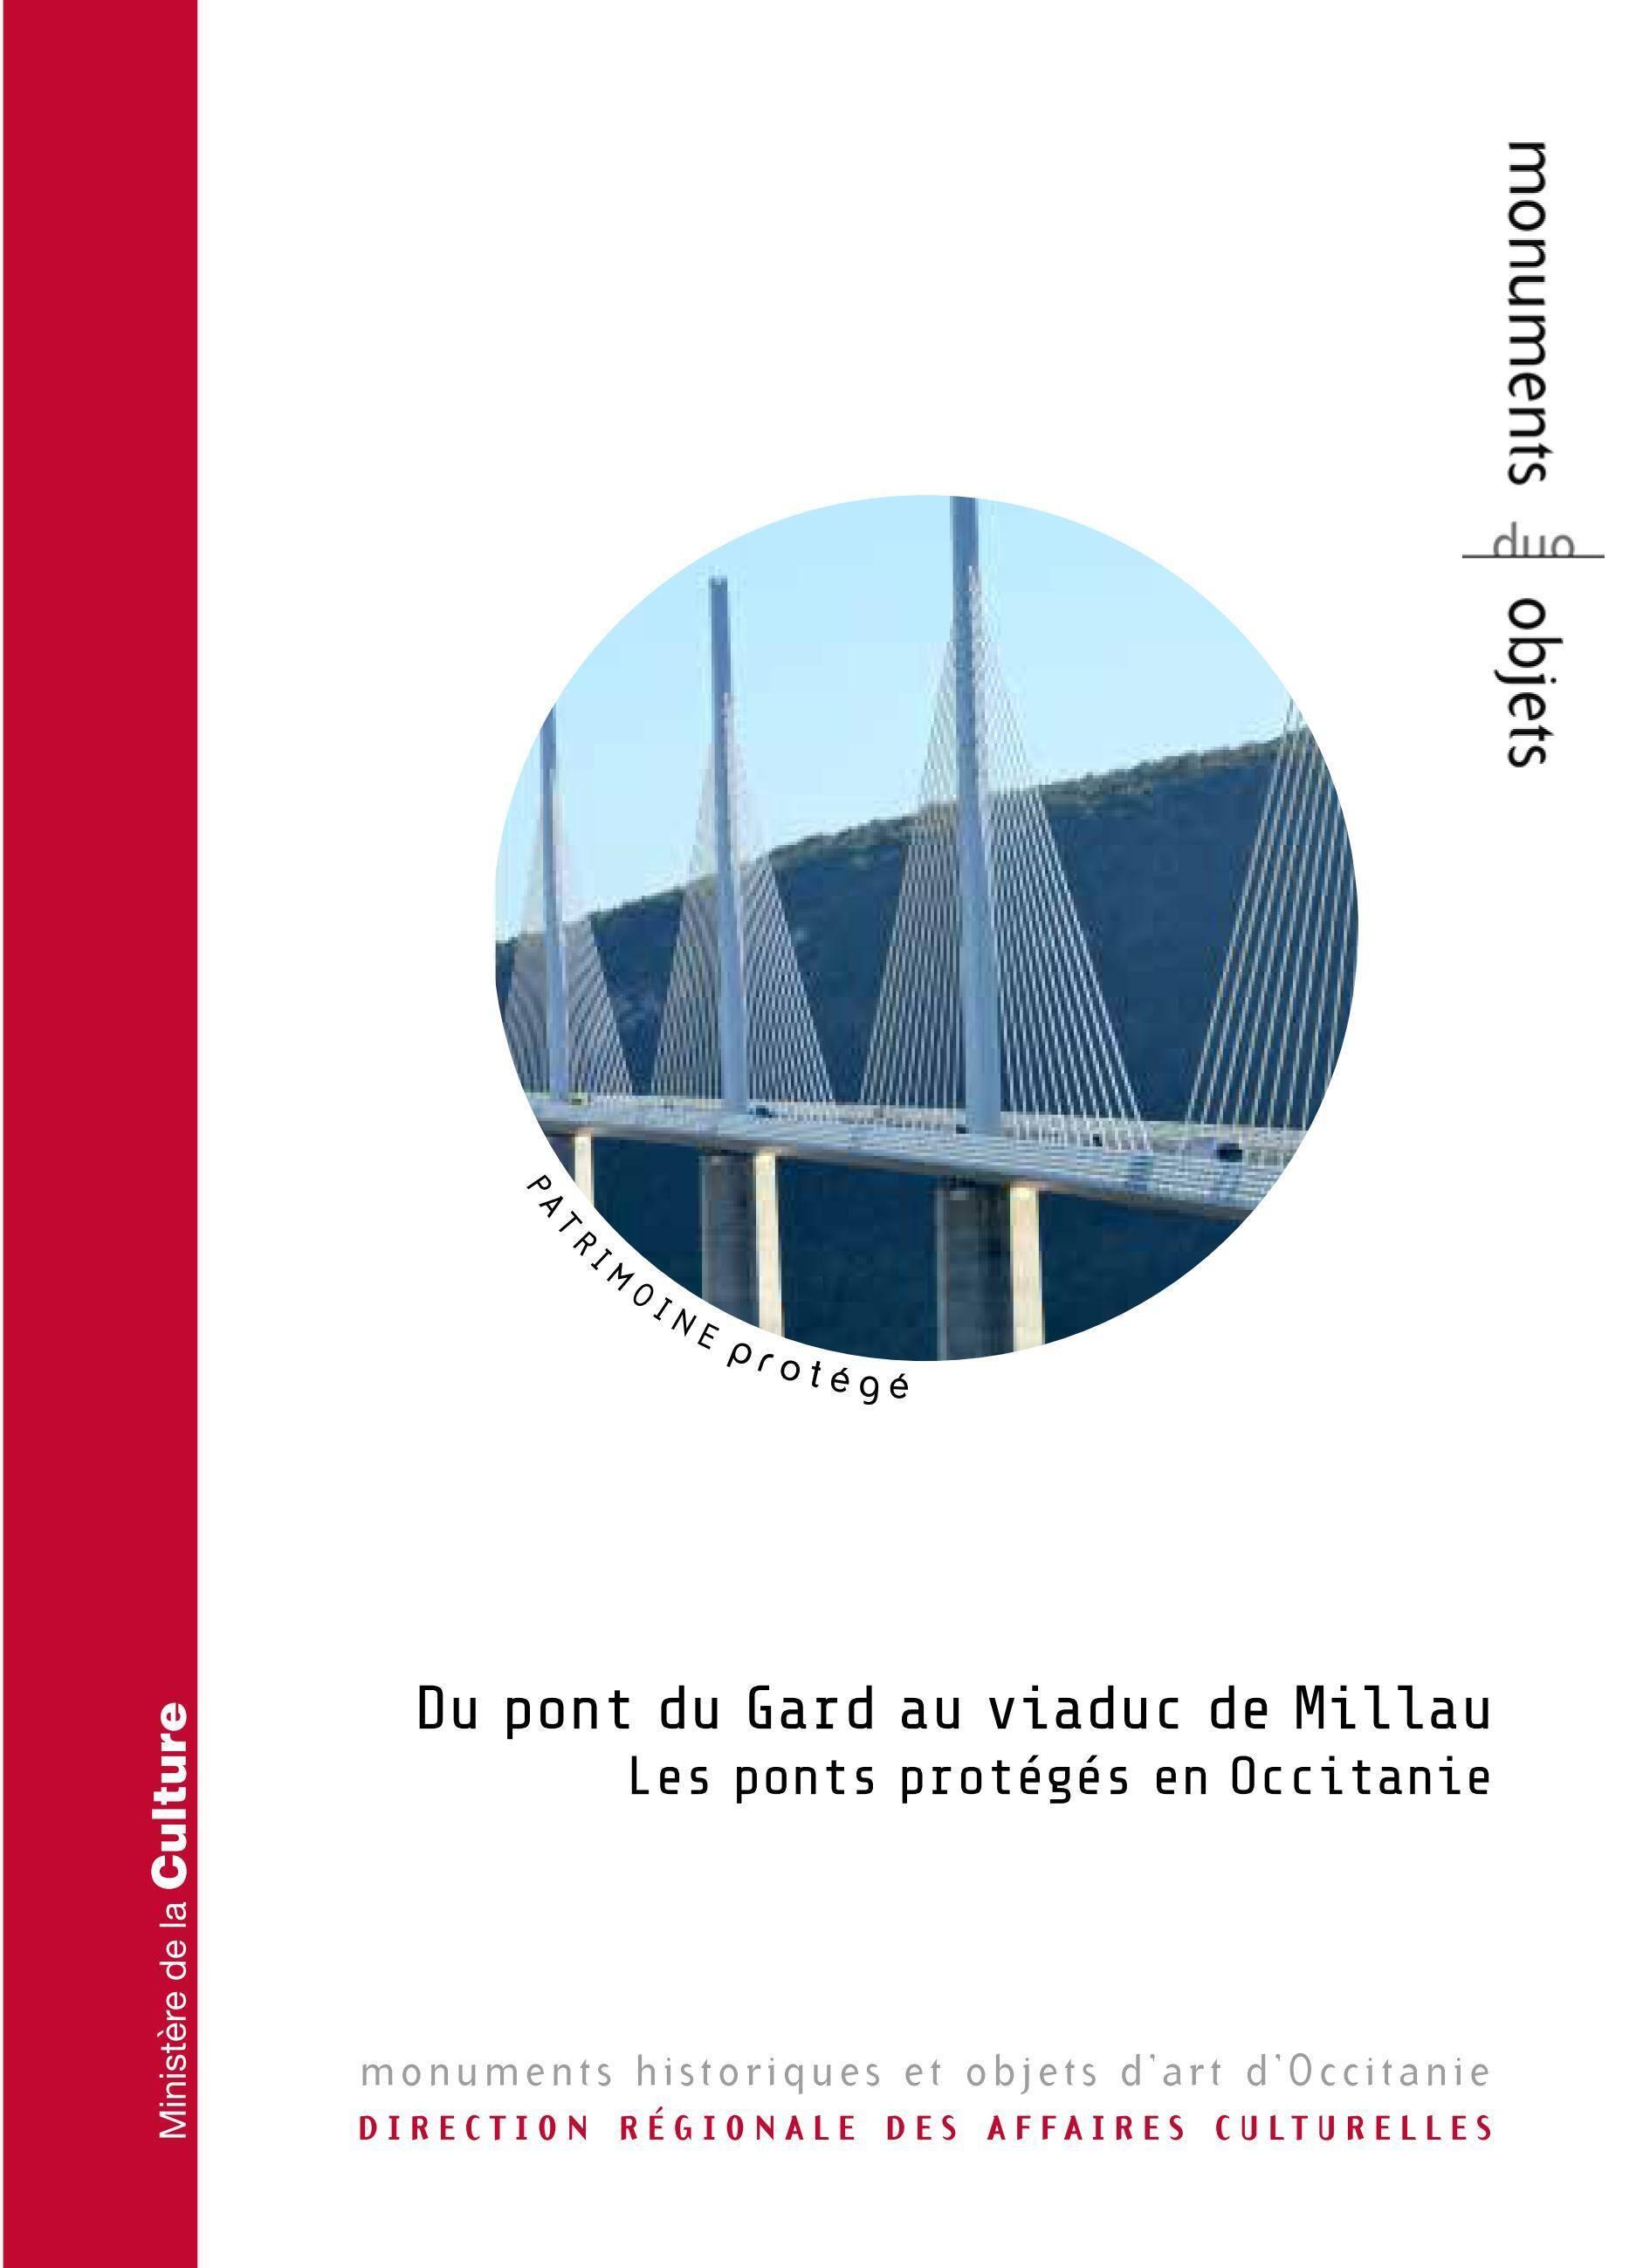 Visuel Duo ponts en Occitanie